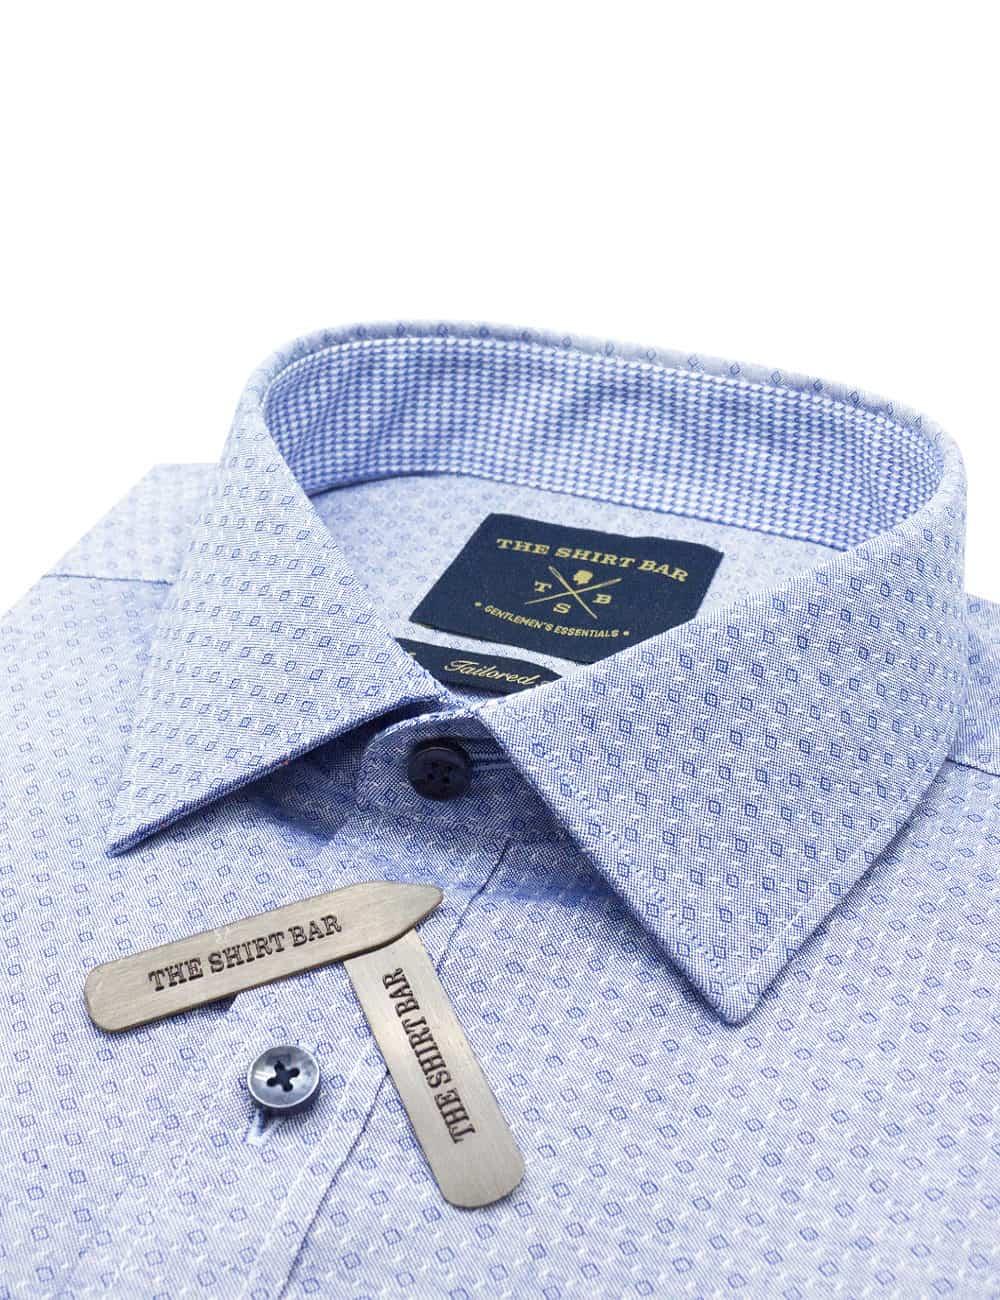 TF Blue with Diamond Pattern Cotton Blend Spill Resist Long Sleeve Single Cuff Shirt TF2F7.16